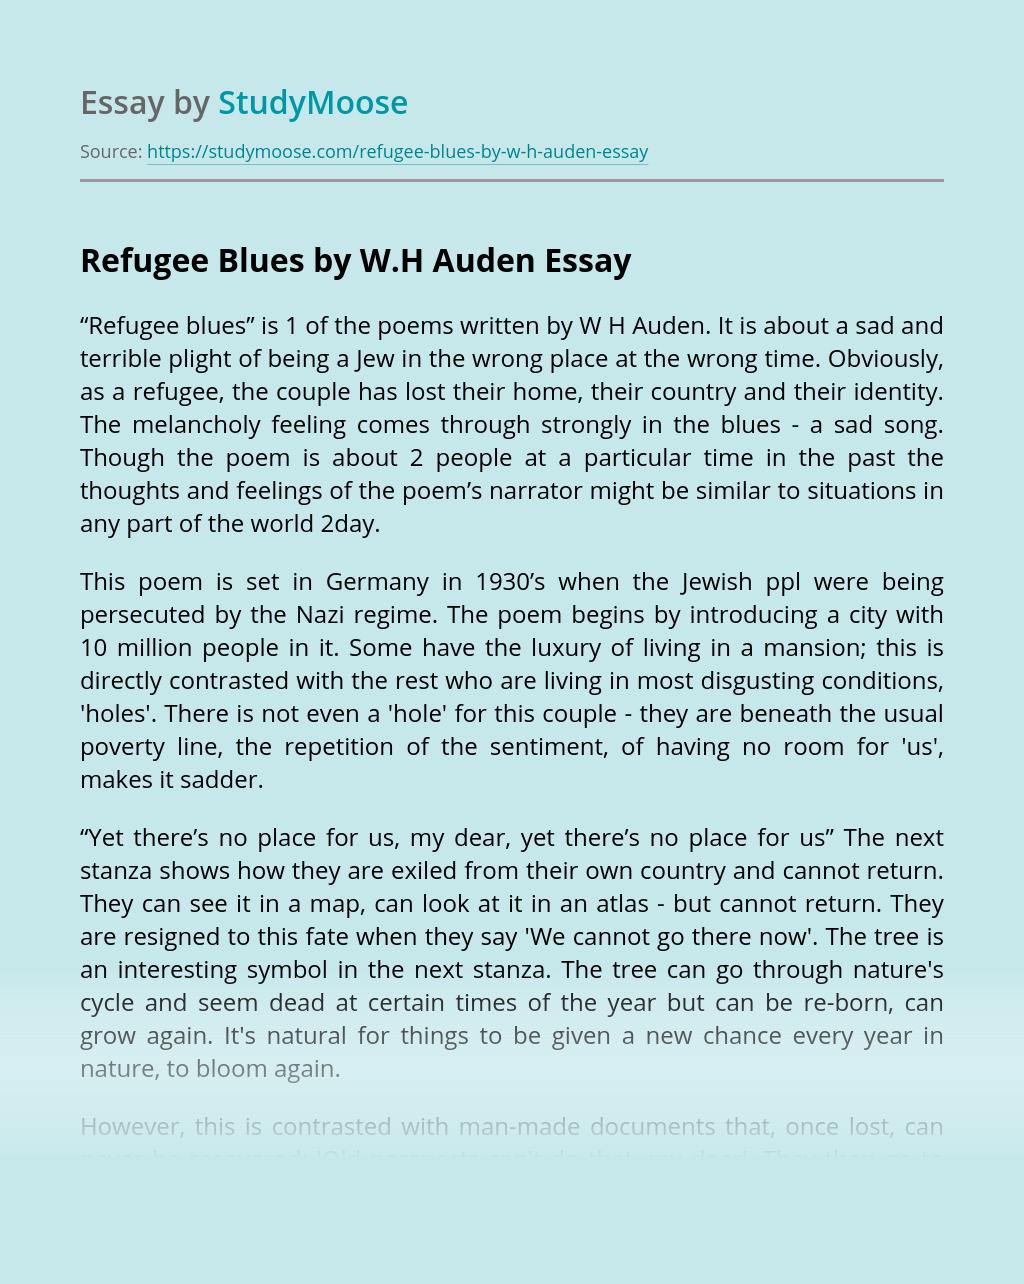 Refugee Blues by W.H Auden